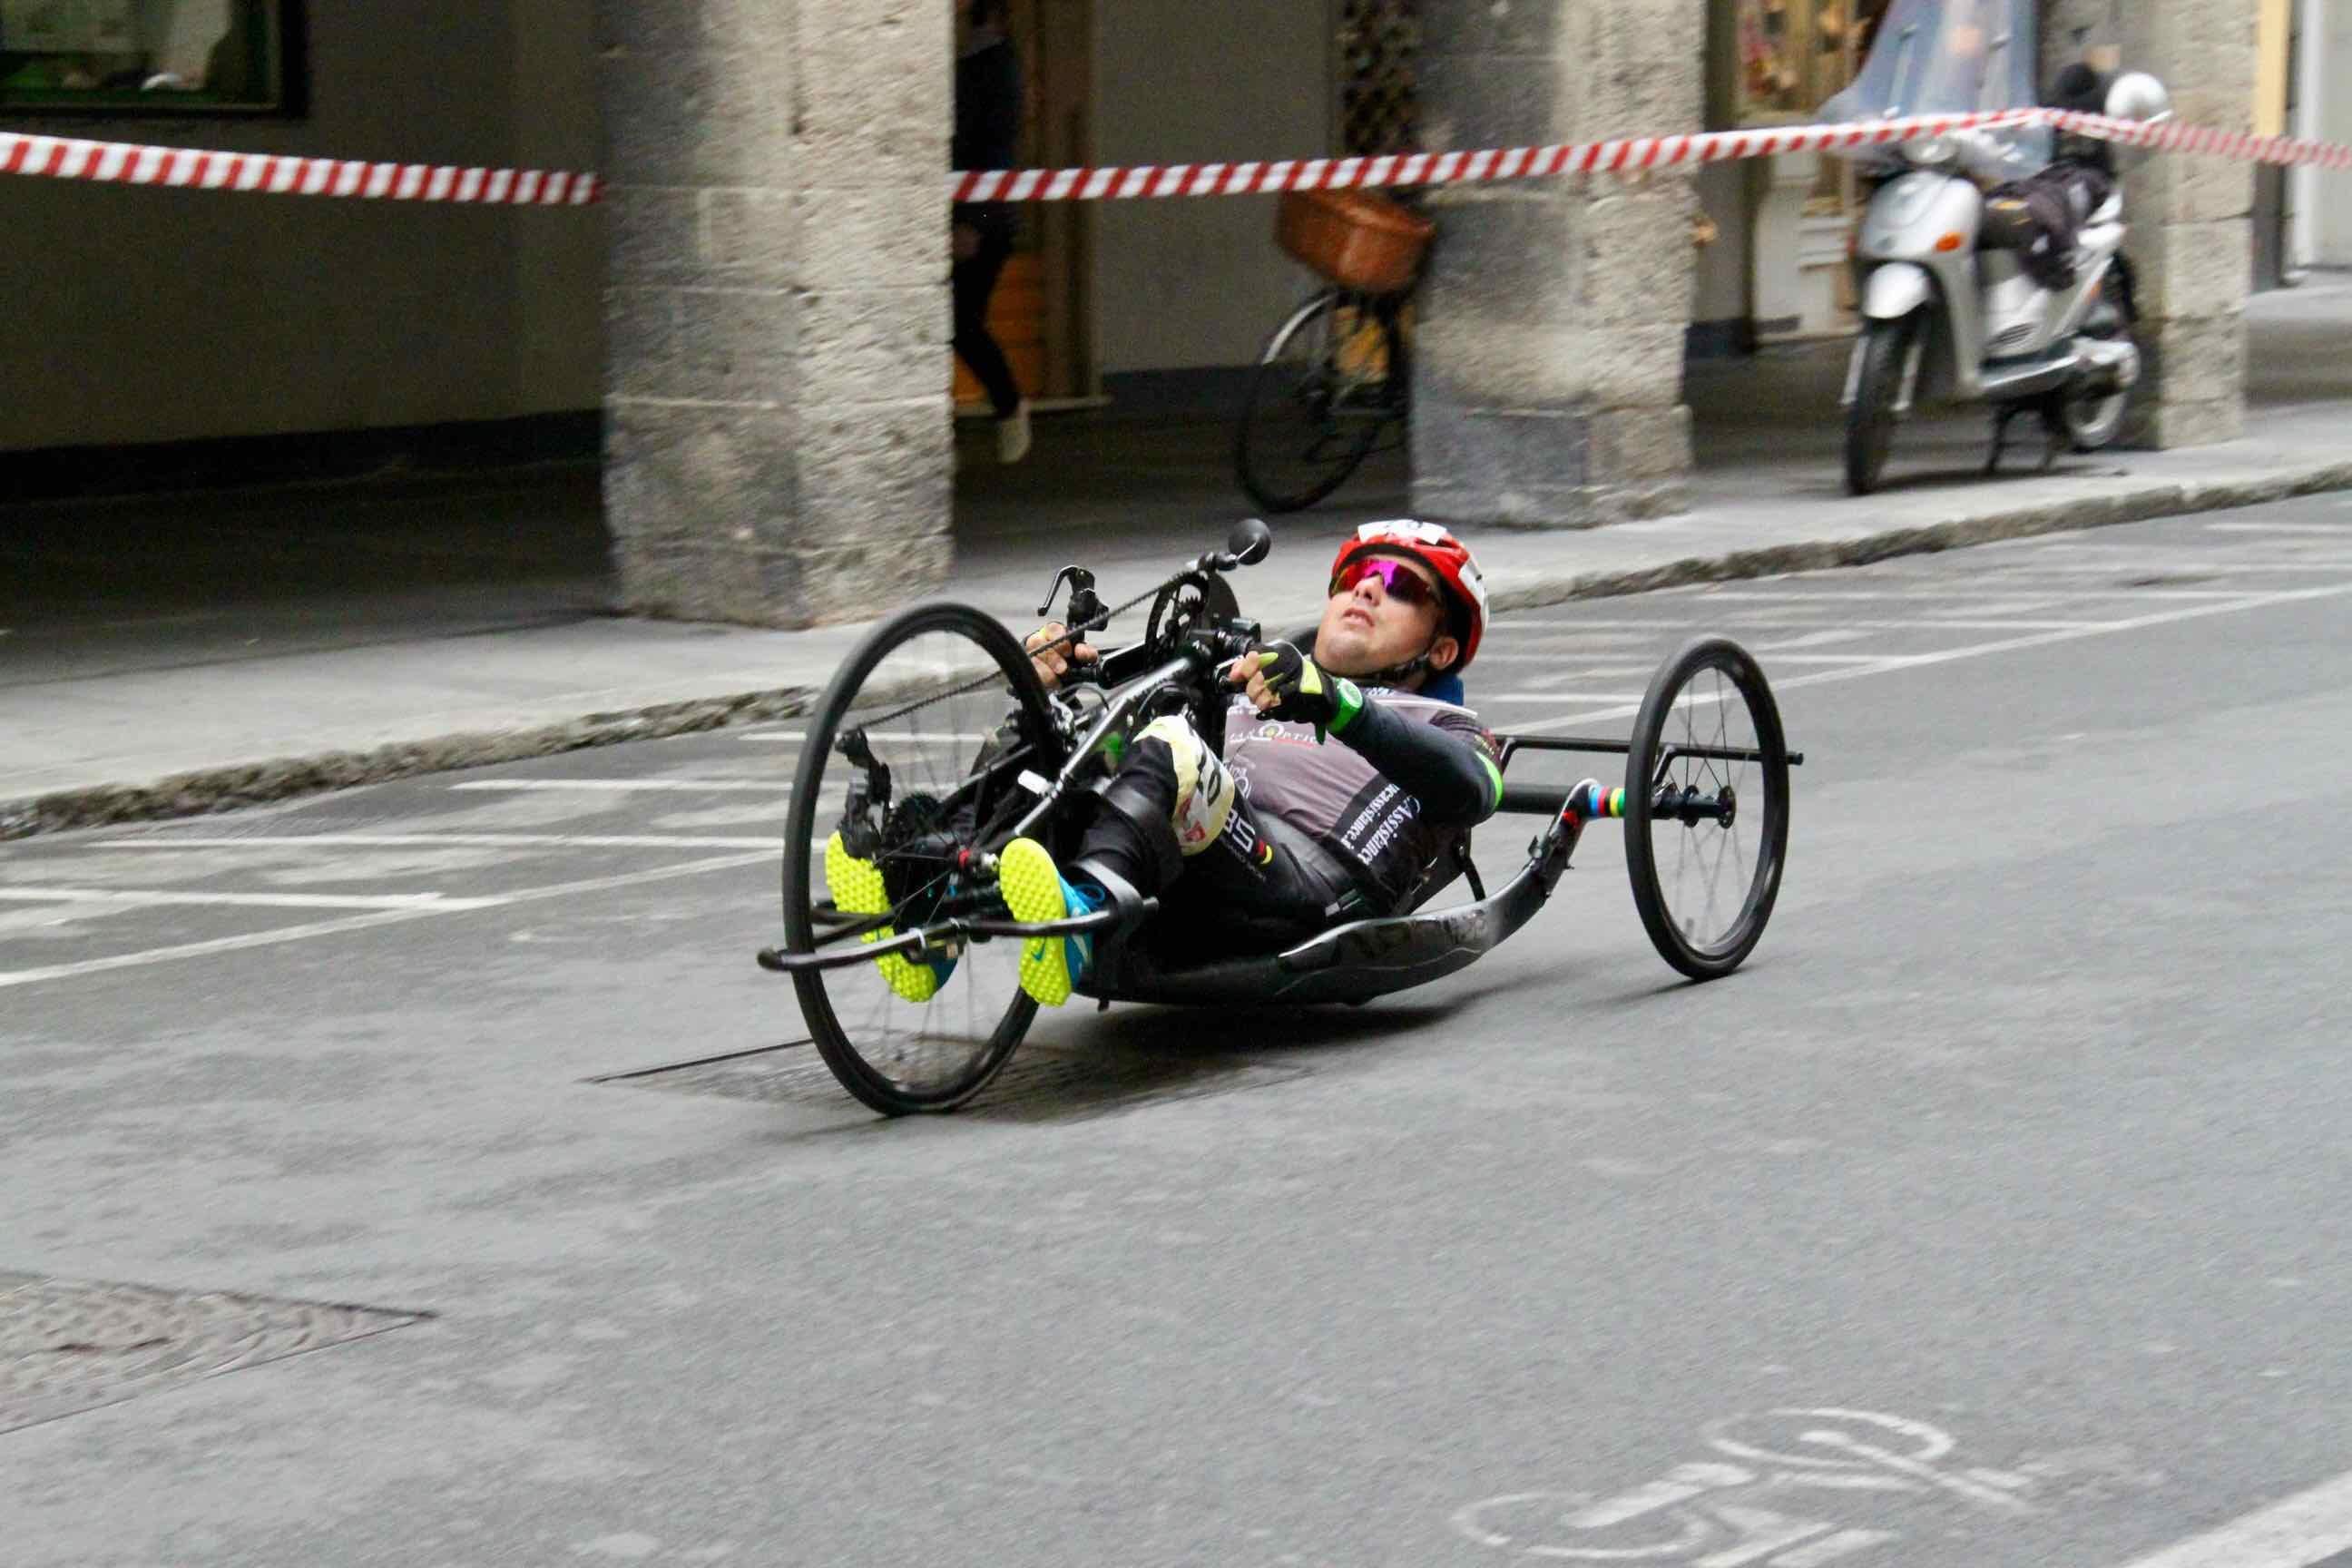 1° Memorial don Nando Negri a Chiavari per il Giro d'Italia Handbike 2018 - 3